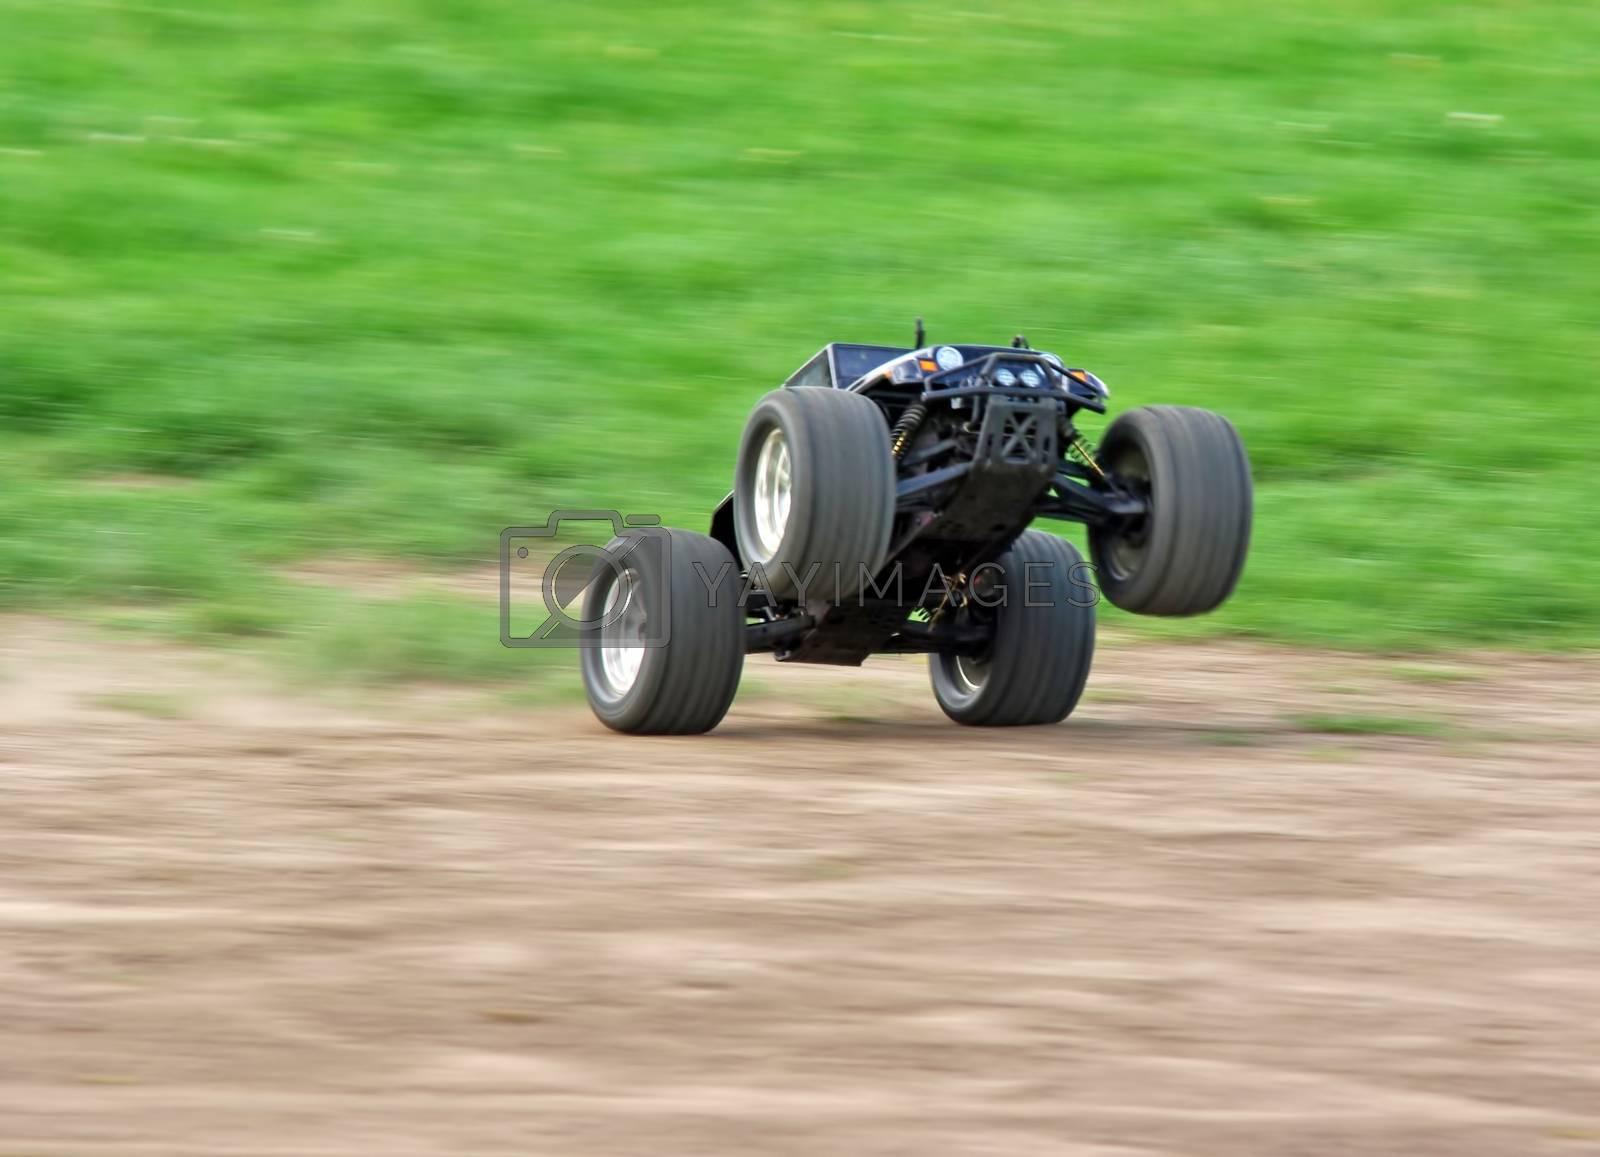 Powerfull radio controlled car speeding on the grass